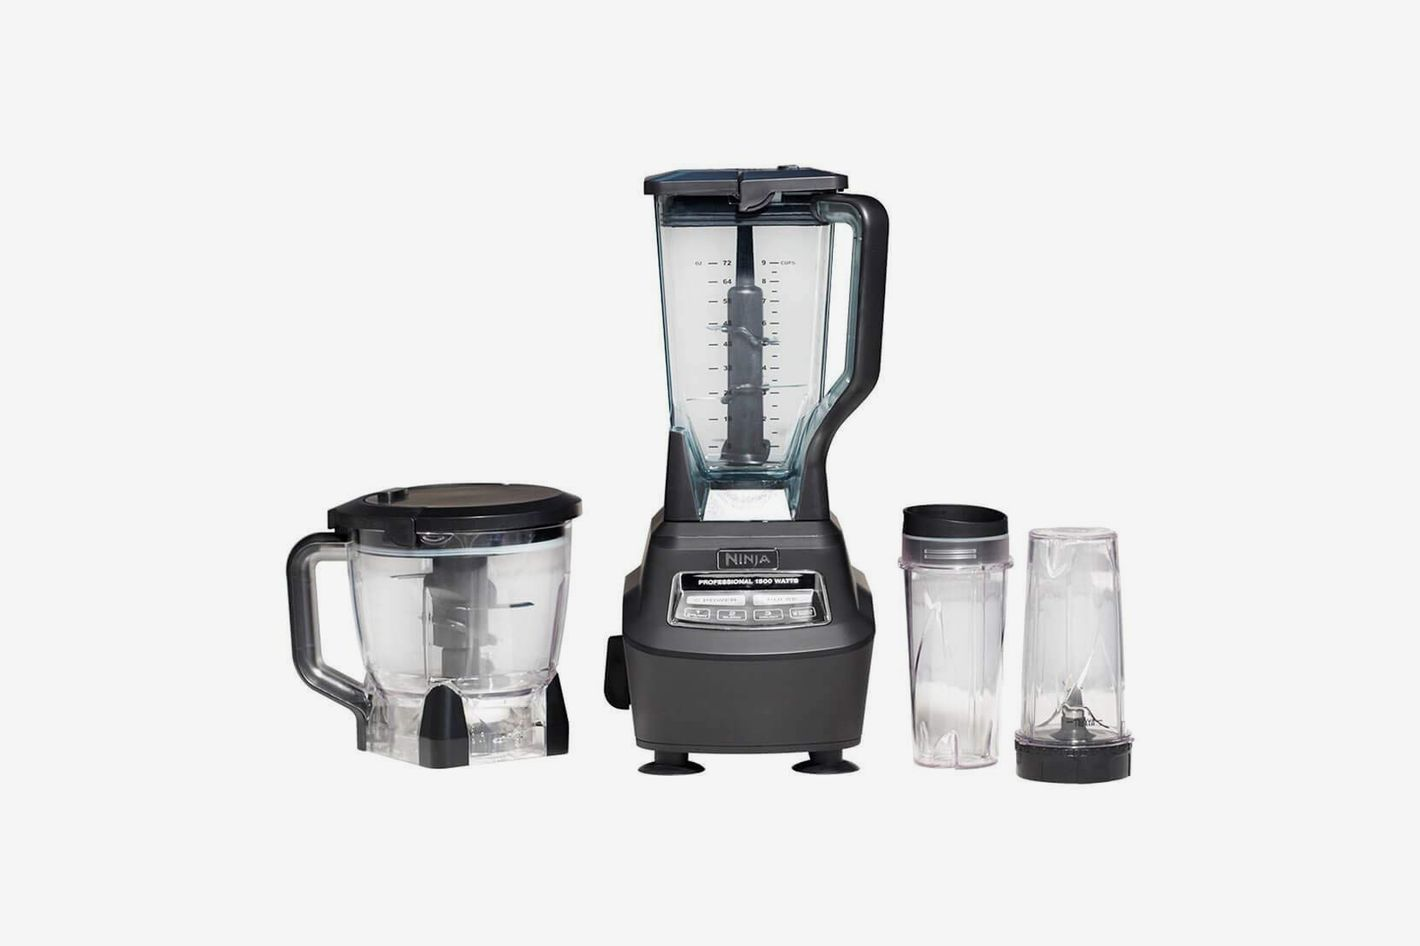 Ninja Mega Kitchen System (Blender, Processor, Nutri Ninja Cups) BL770